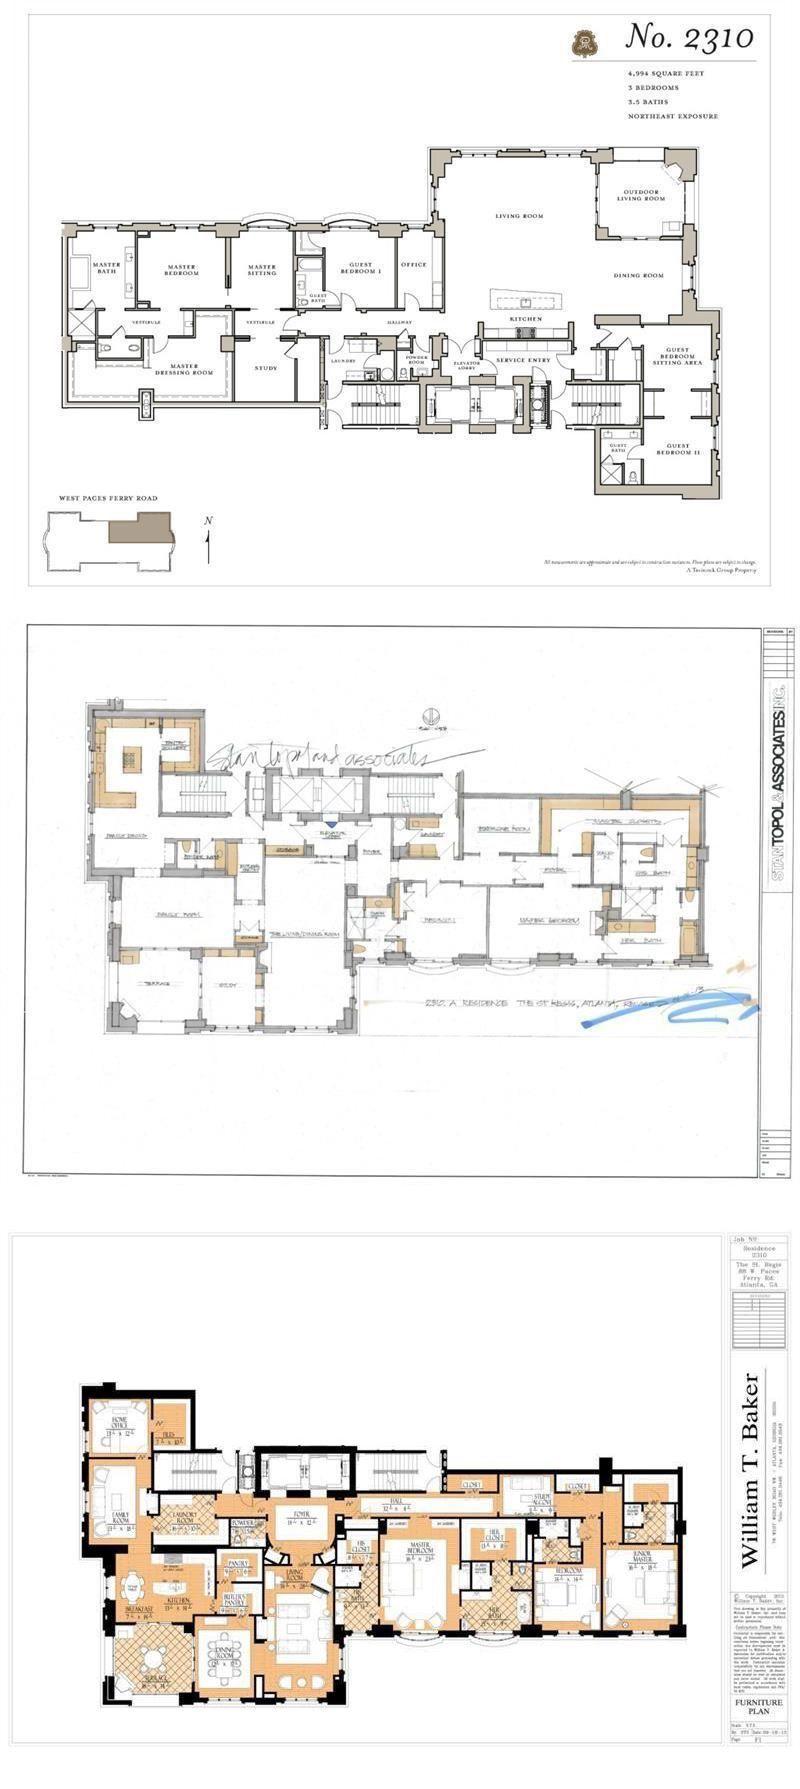 1 Bedroom Apartments In Atlanta Under 700 | Eqazadiv Home ...